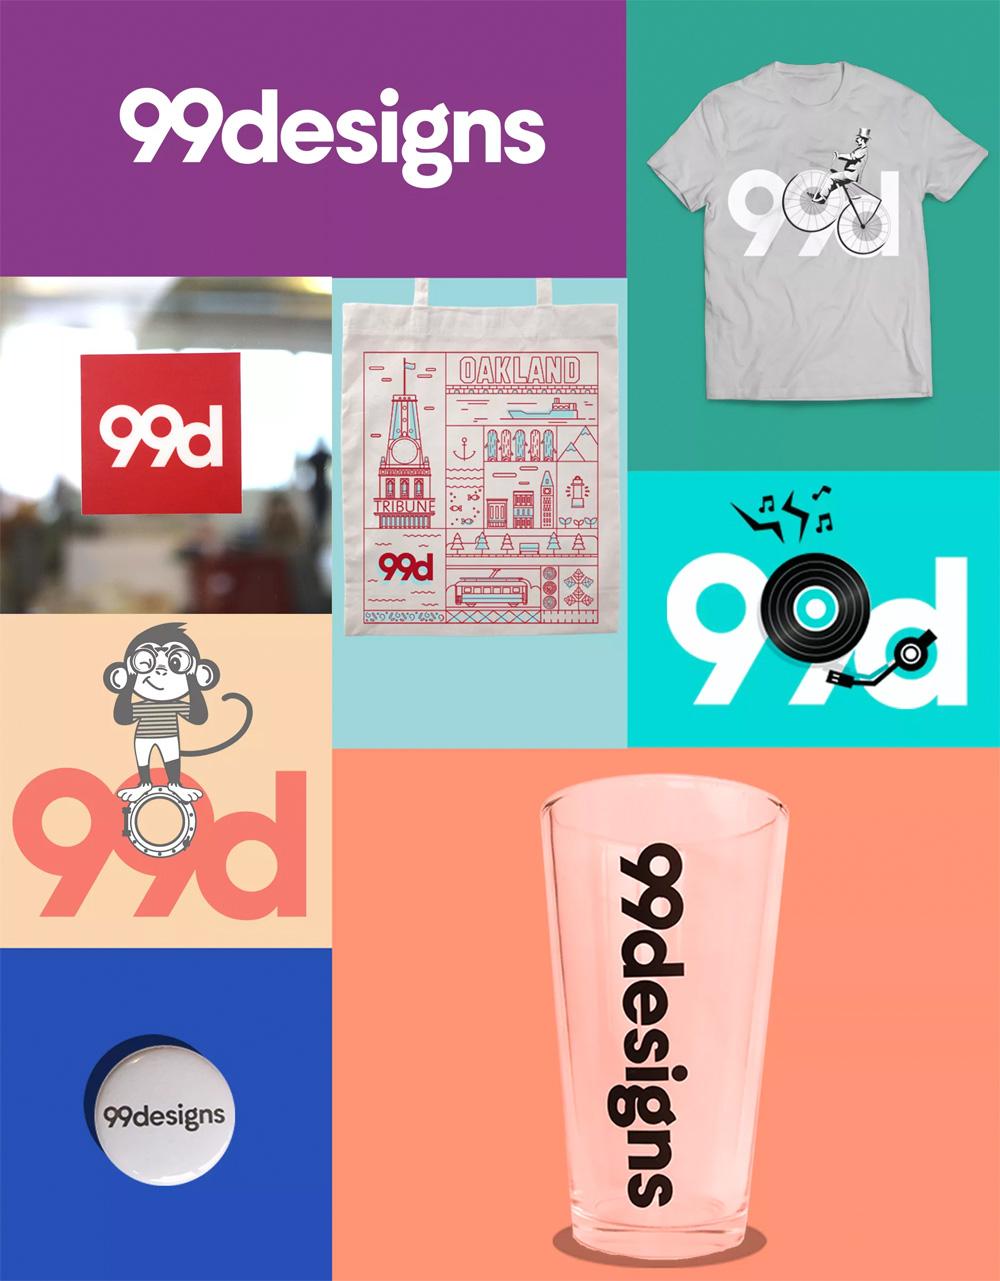 New Logo for 99designs by Meisal Subkhan